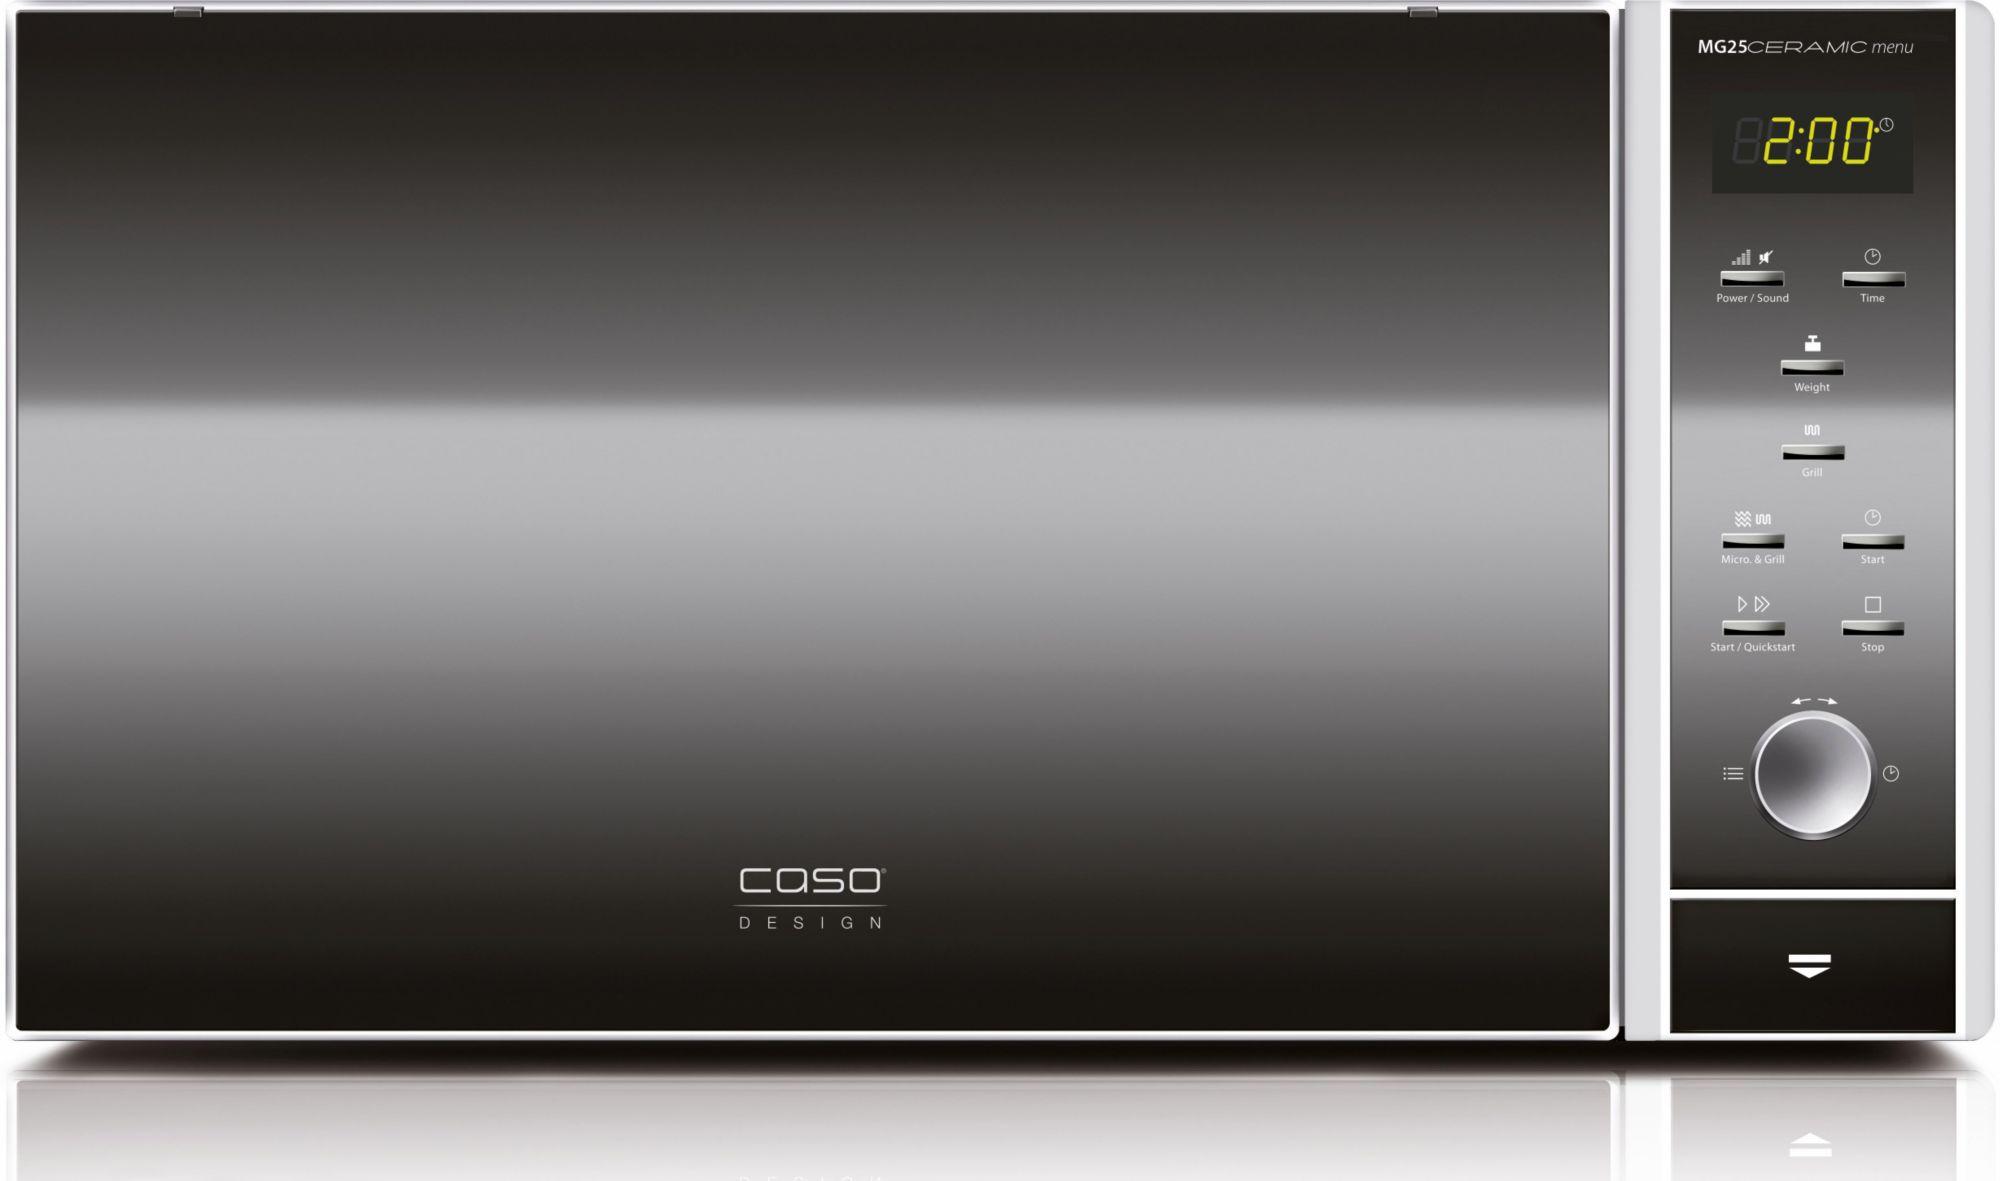 CASO DESIGN CASO Design Mikrowelle CASO MG25C menu 2in1, mit Grill, 25 Liter Garraum, 900 Watt